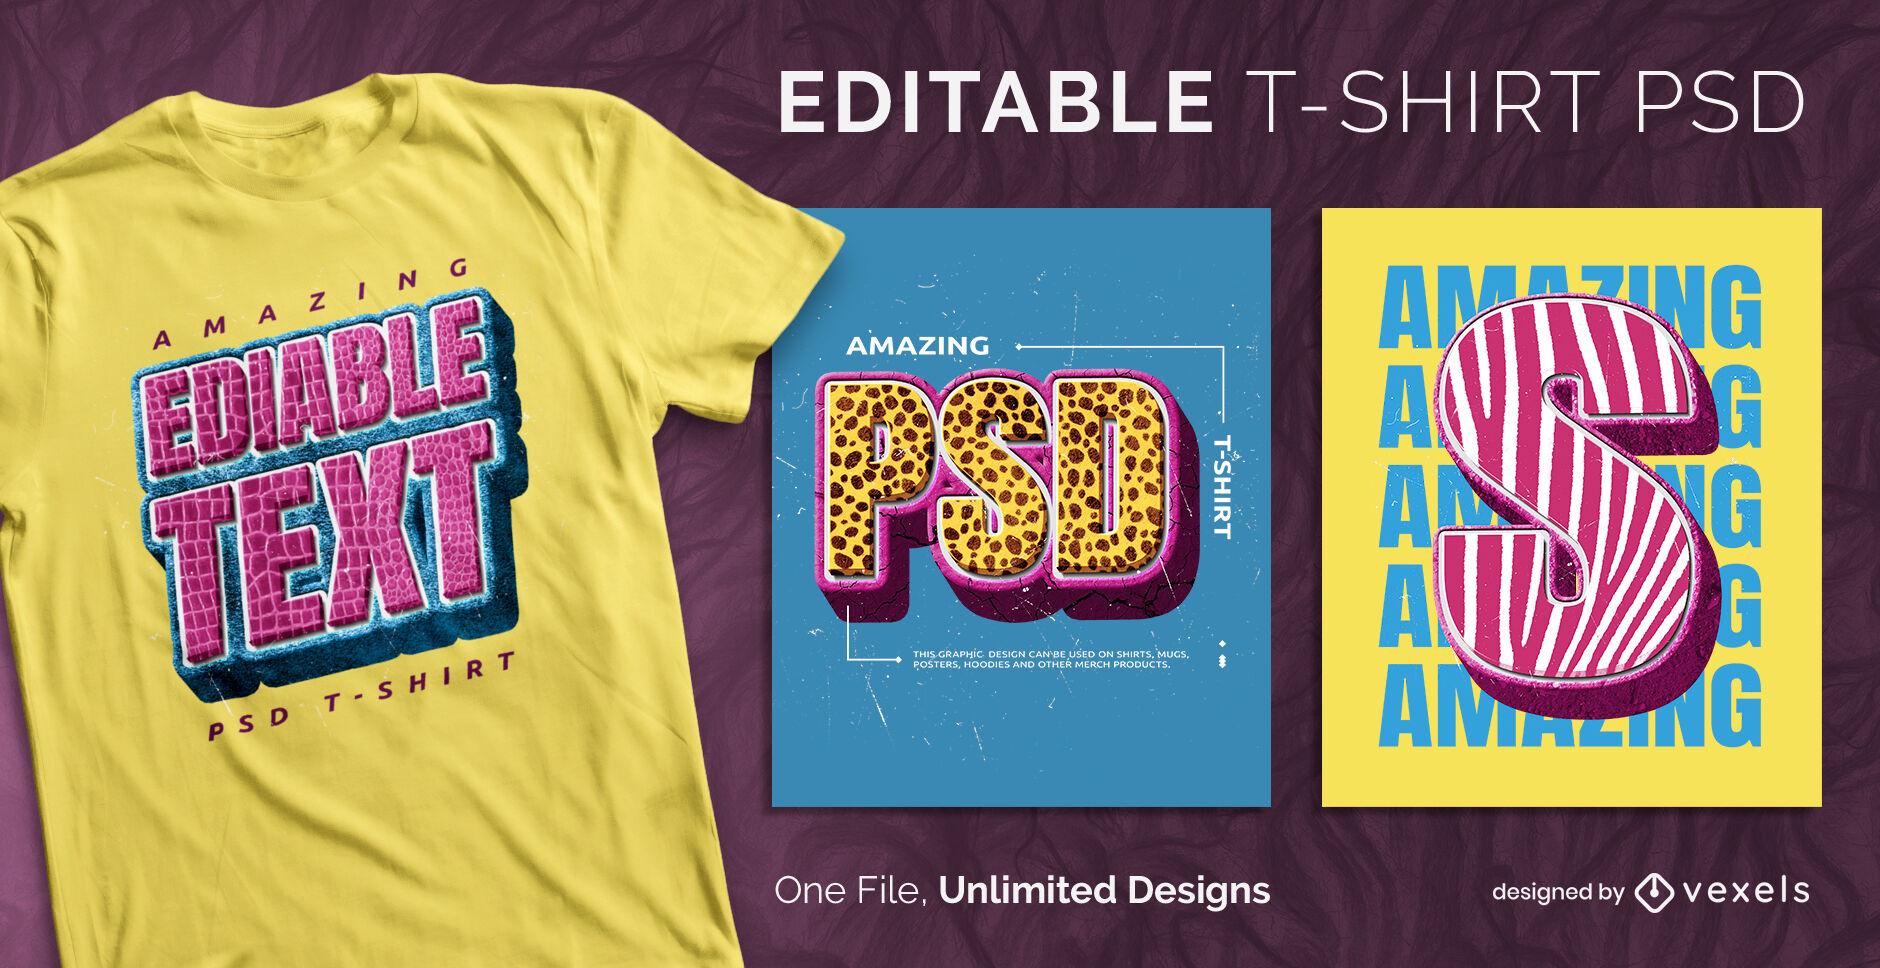 Textured texts scalable t-shirt psd